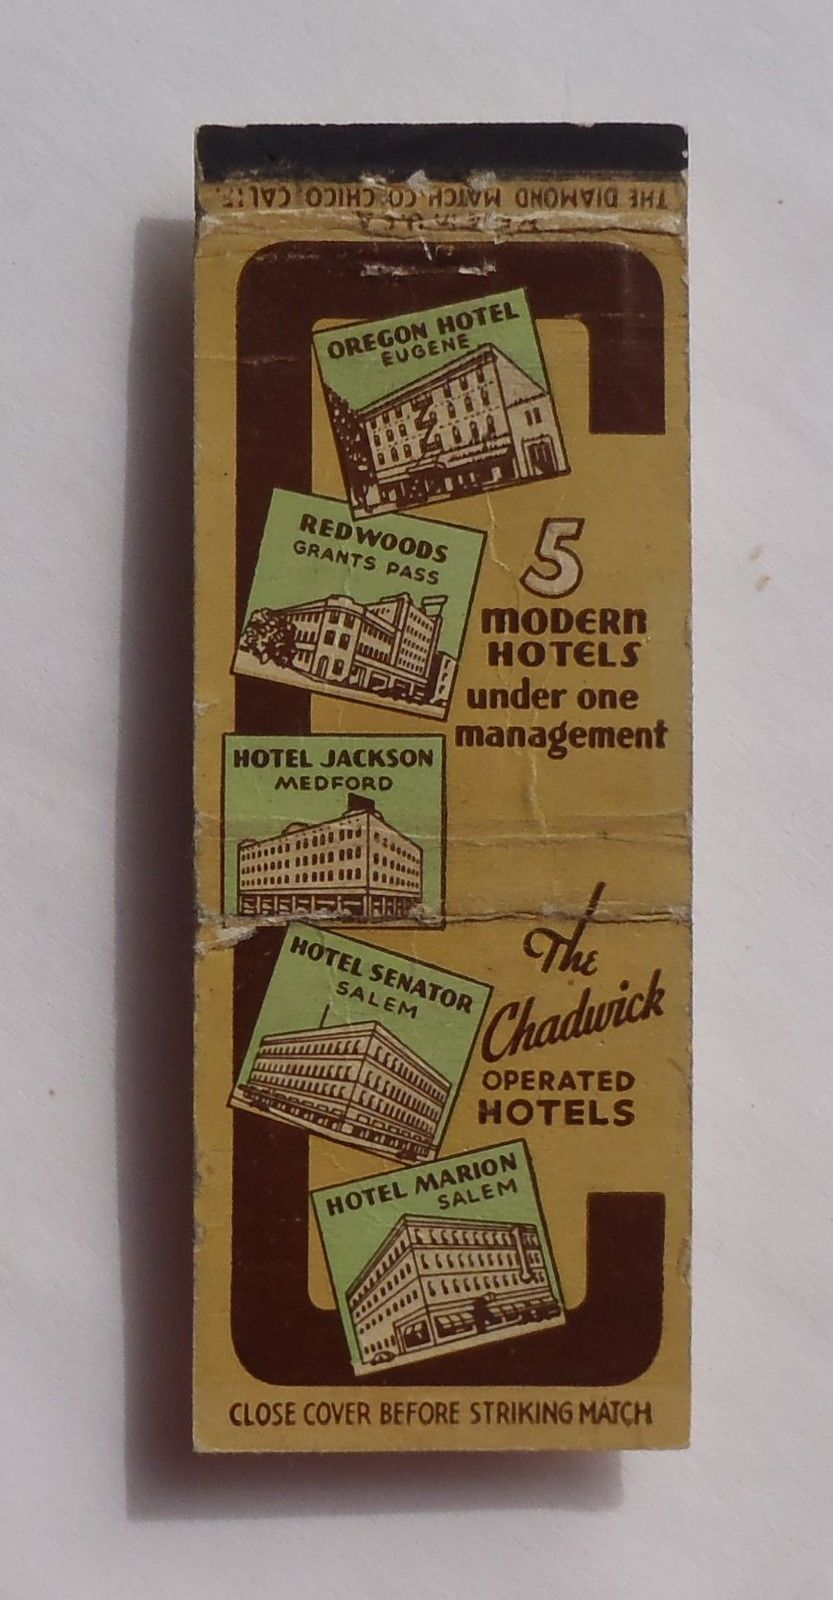 Chadwick Hotel In Oregon Oregon Hotels Matchbook Hotel